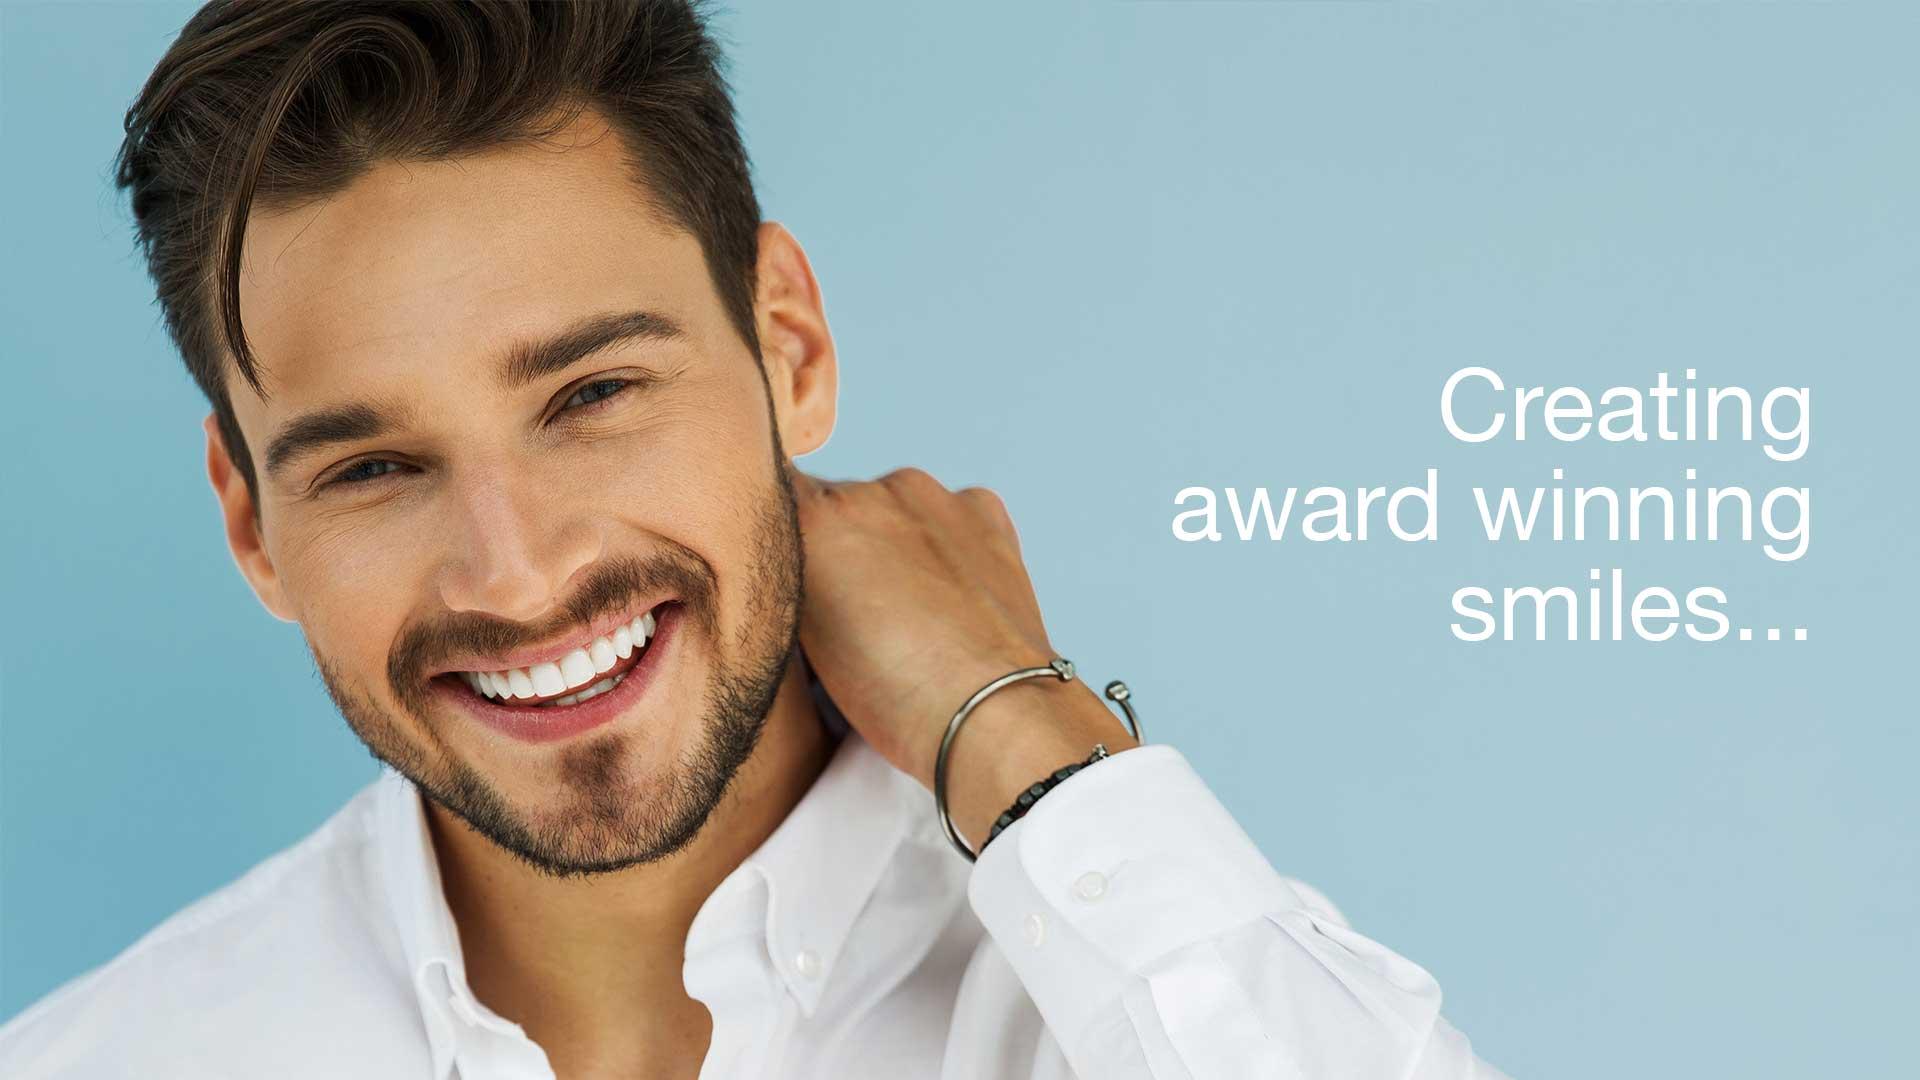 Eden Shores Dental Care - Creating award winning smiles...